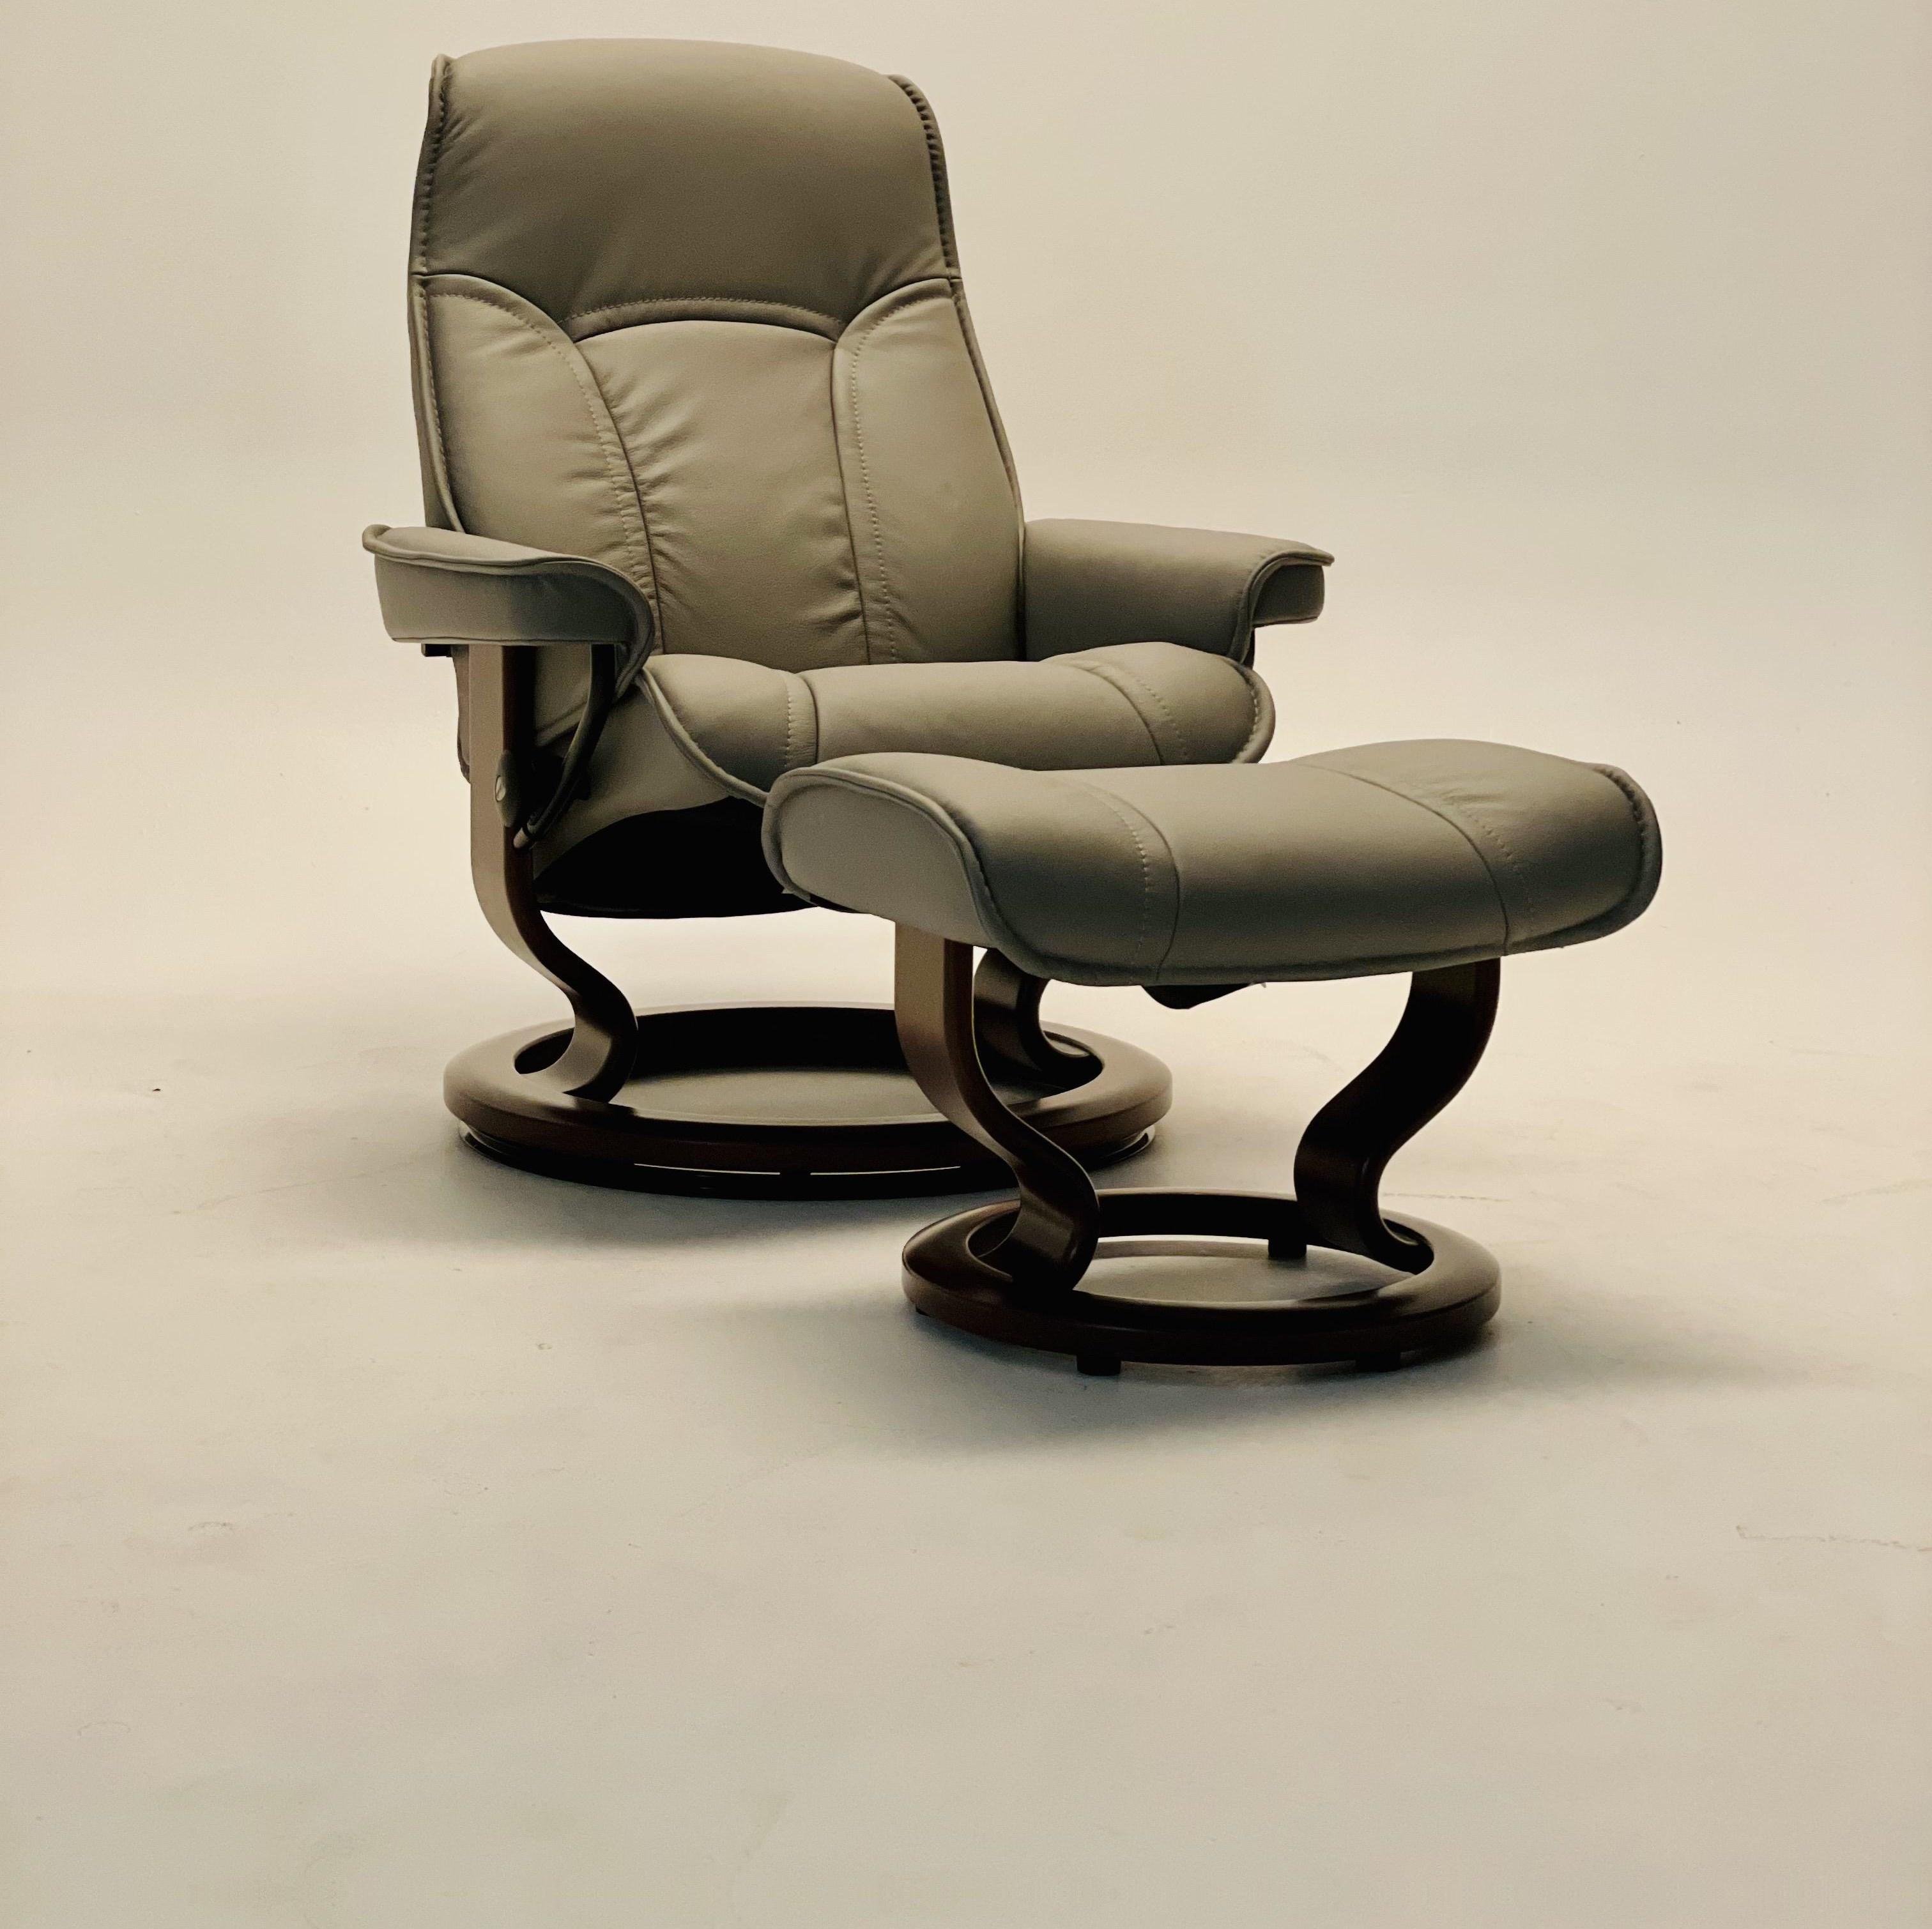 Stressless Senator Medium Classic Reclining Chair and Ottoman by Stressless at Baer's Furniture